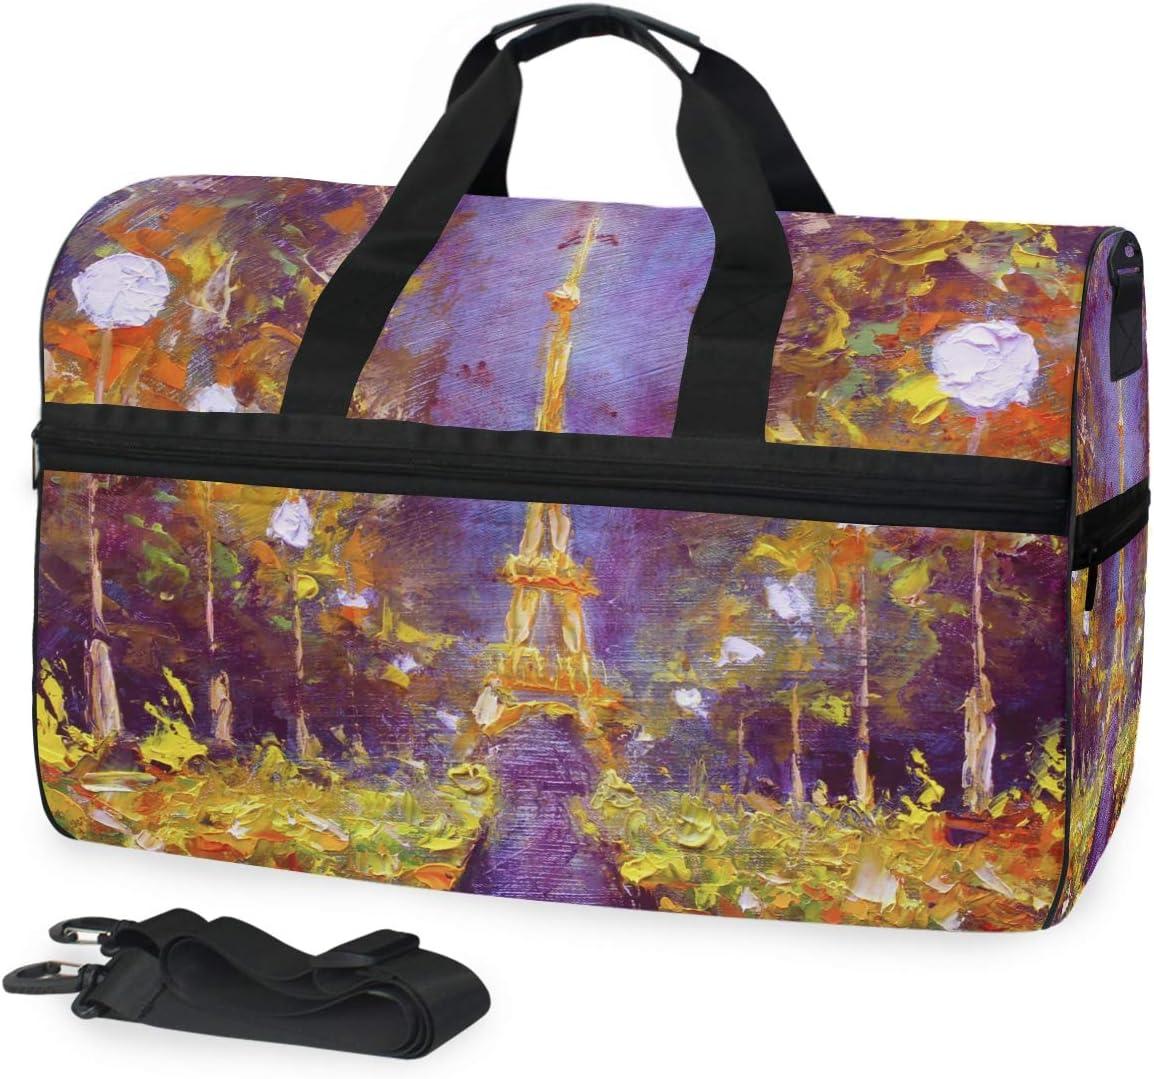 TFONE Watercolor Art Paris Eiffel Tower Duffel Bag Sports Gym Weekend Bags with Shoe Compartmen